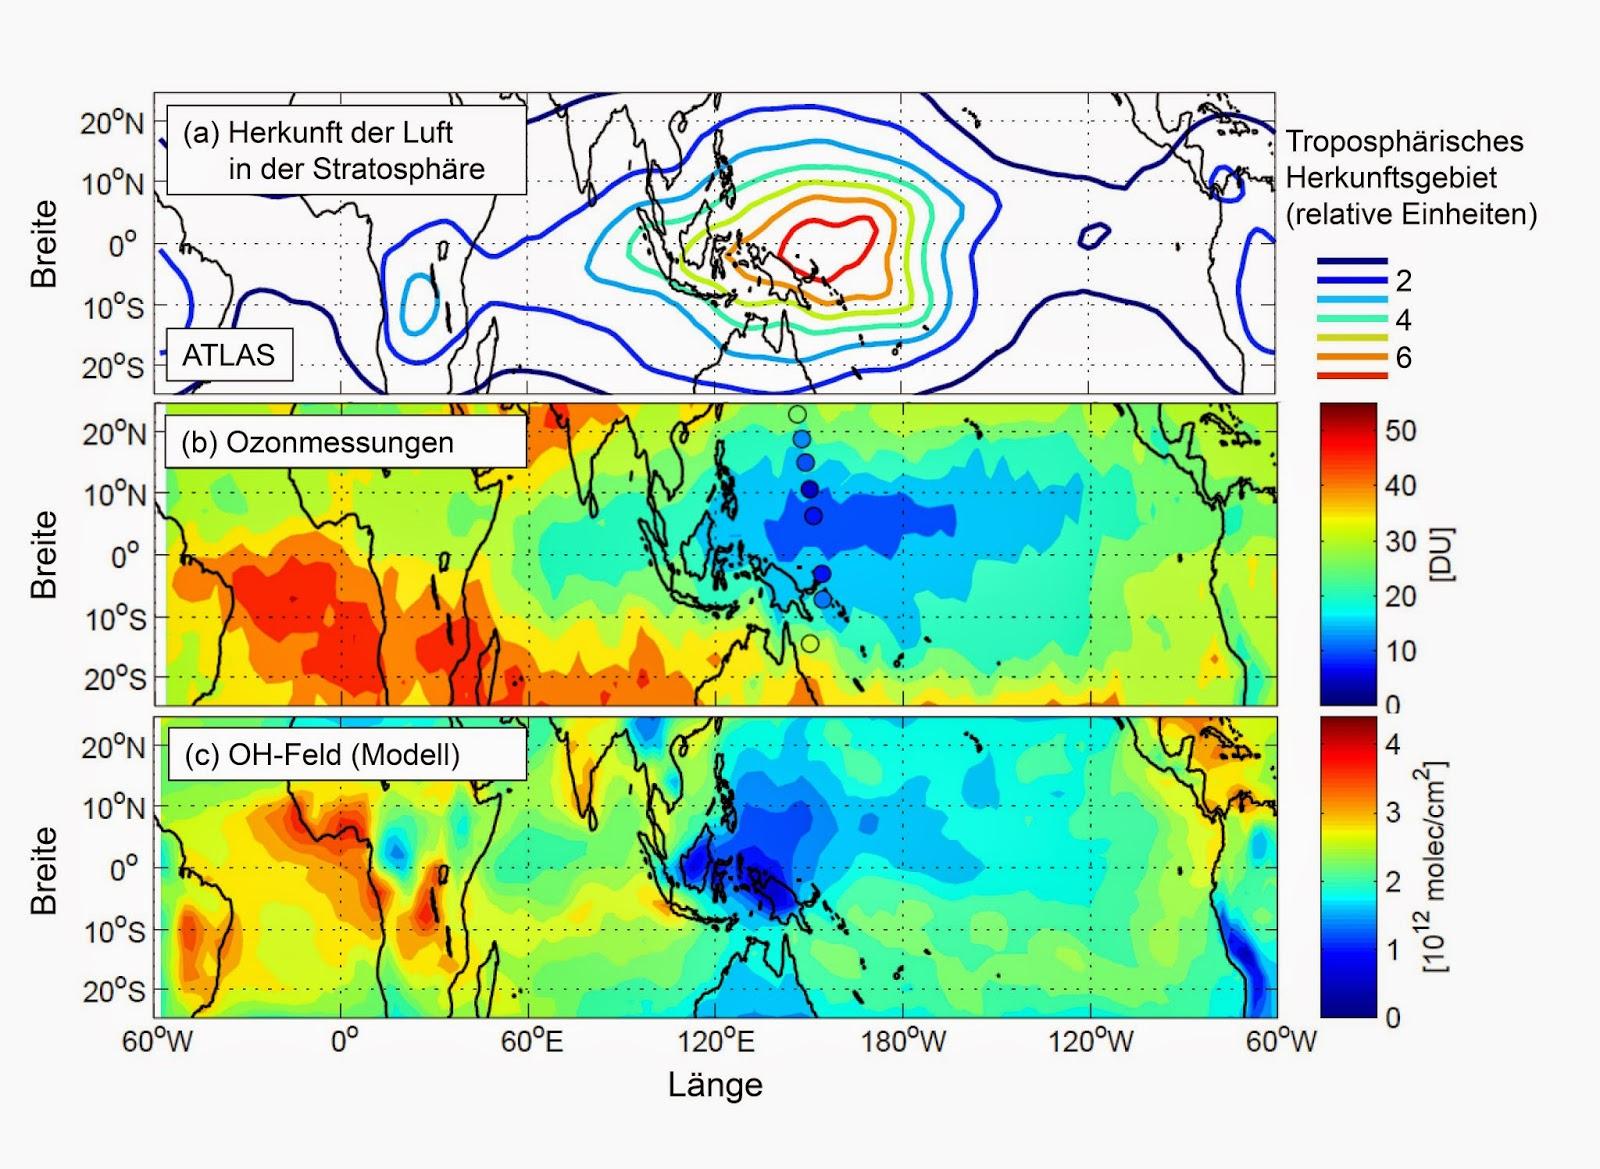 Seemorerocks: Ozone depletion in the polar regions